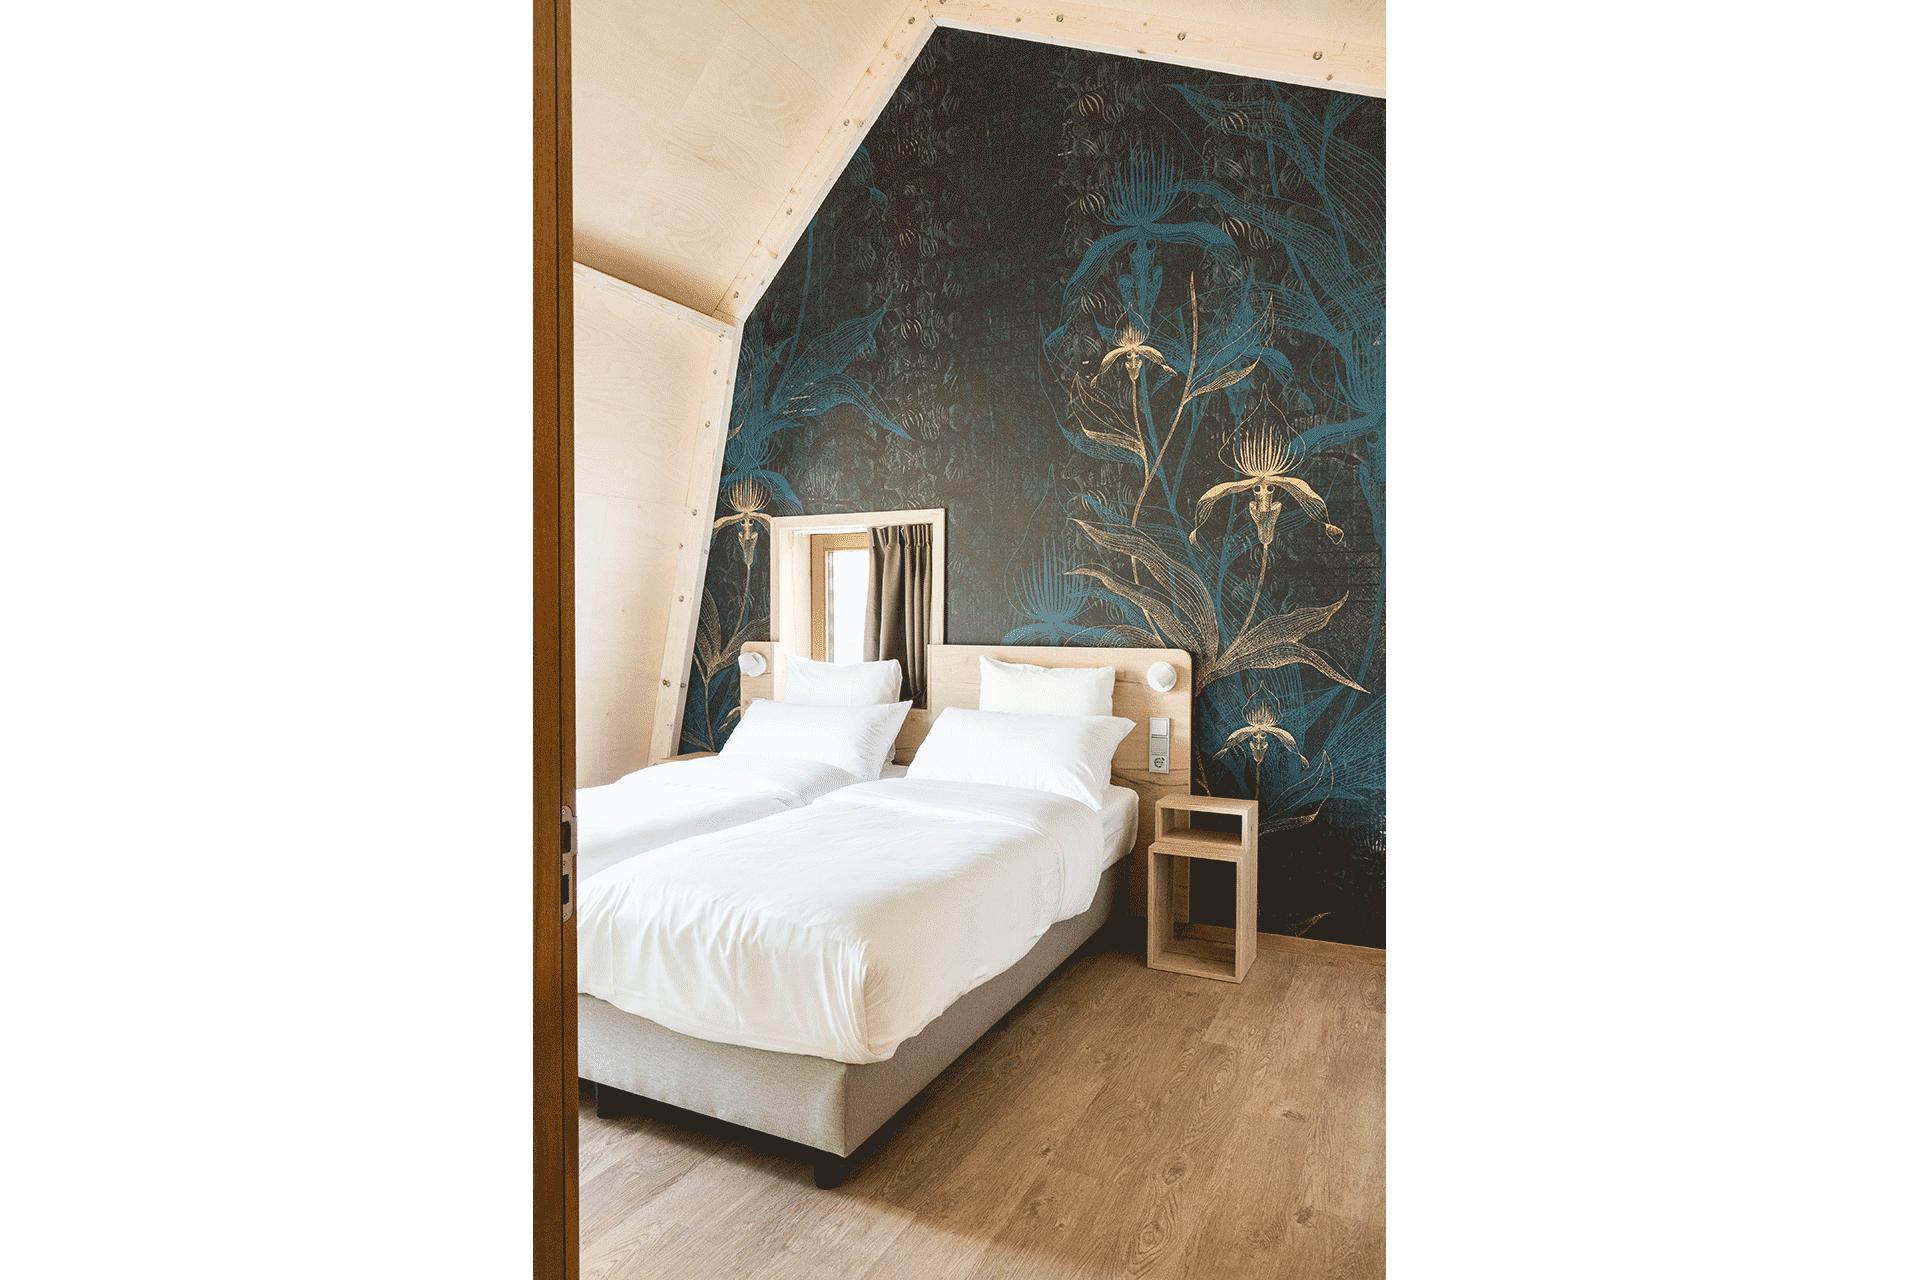 hotelkamer blauw patroon hout duurzaam raam bed duurzaam passief huis licht